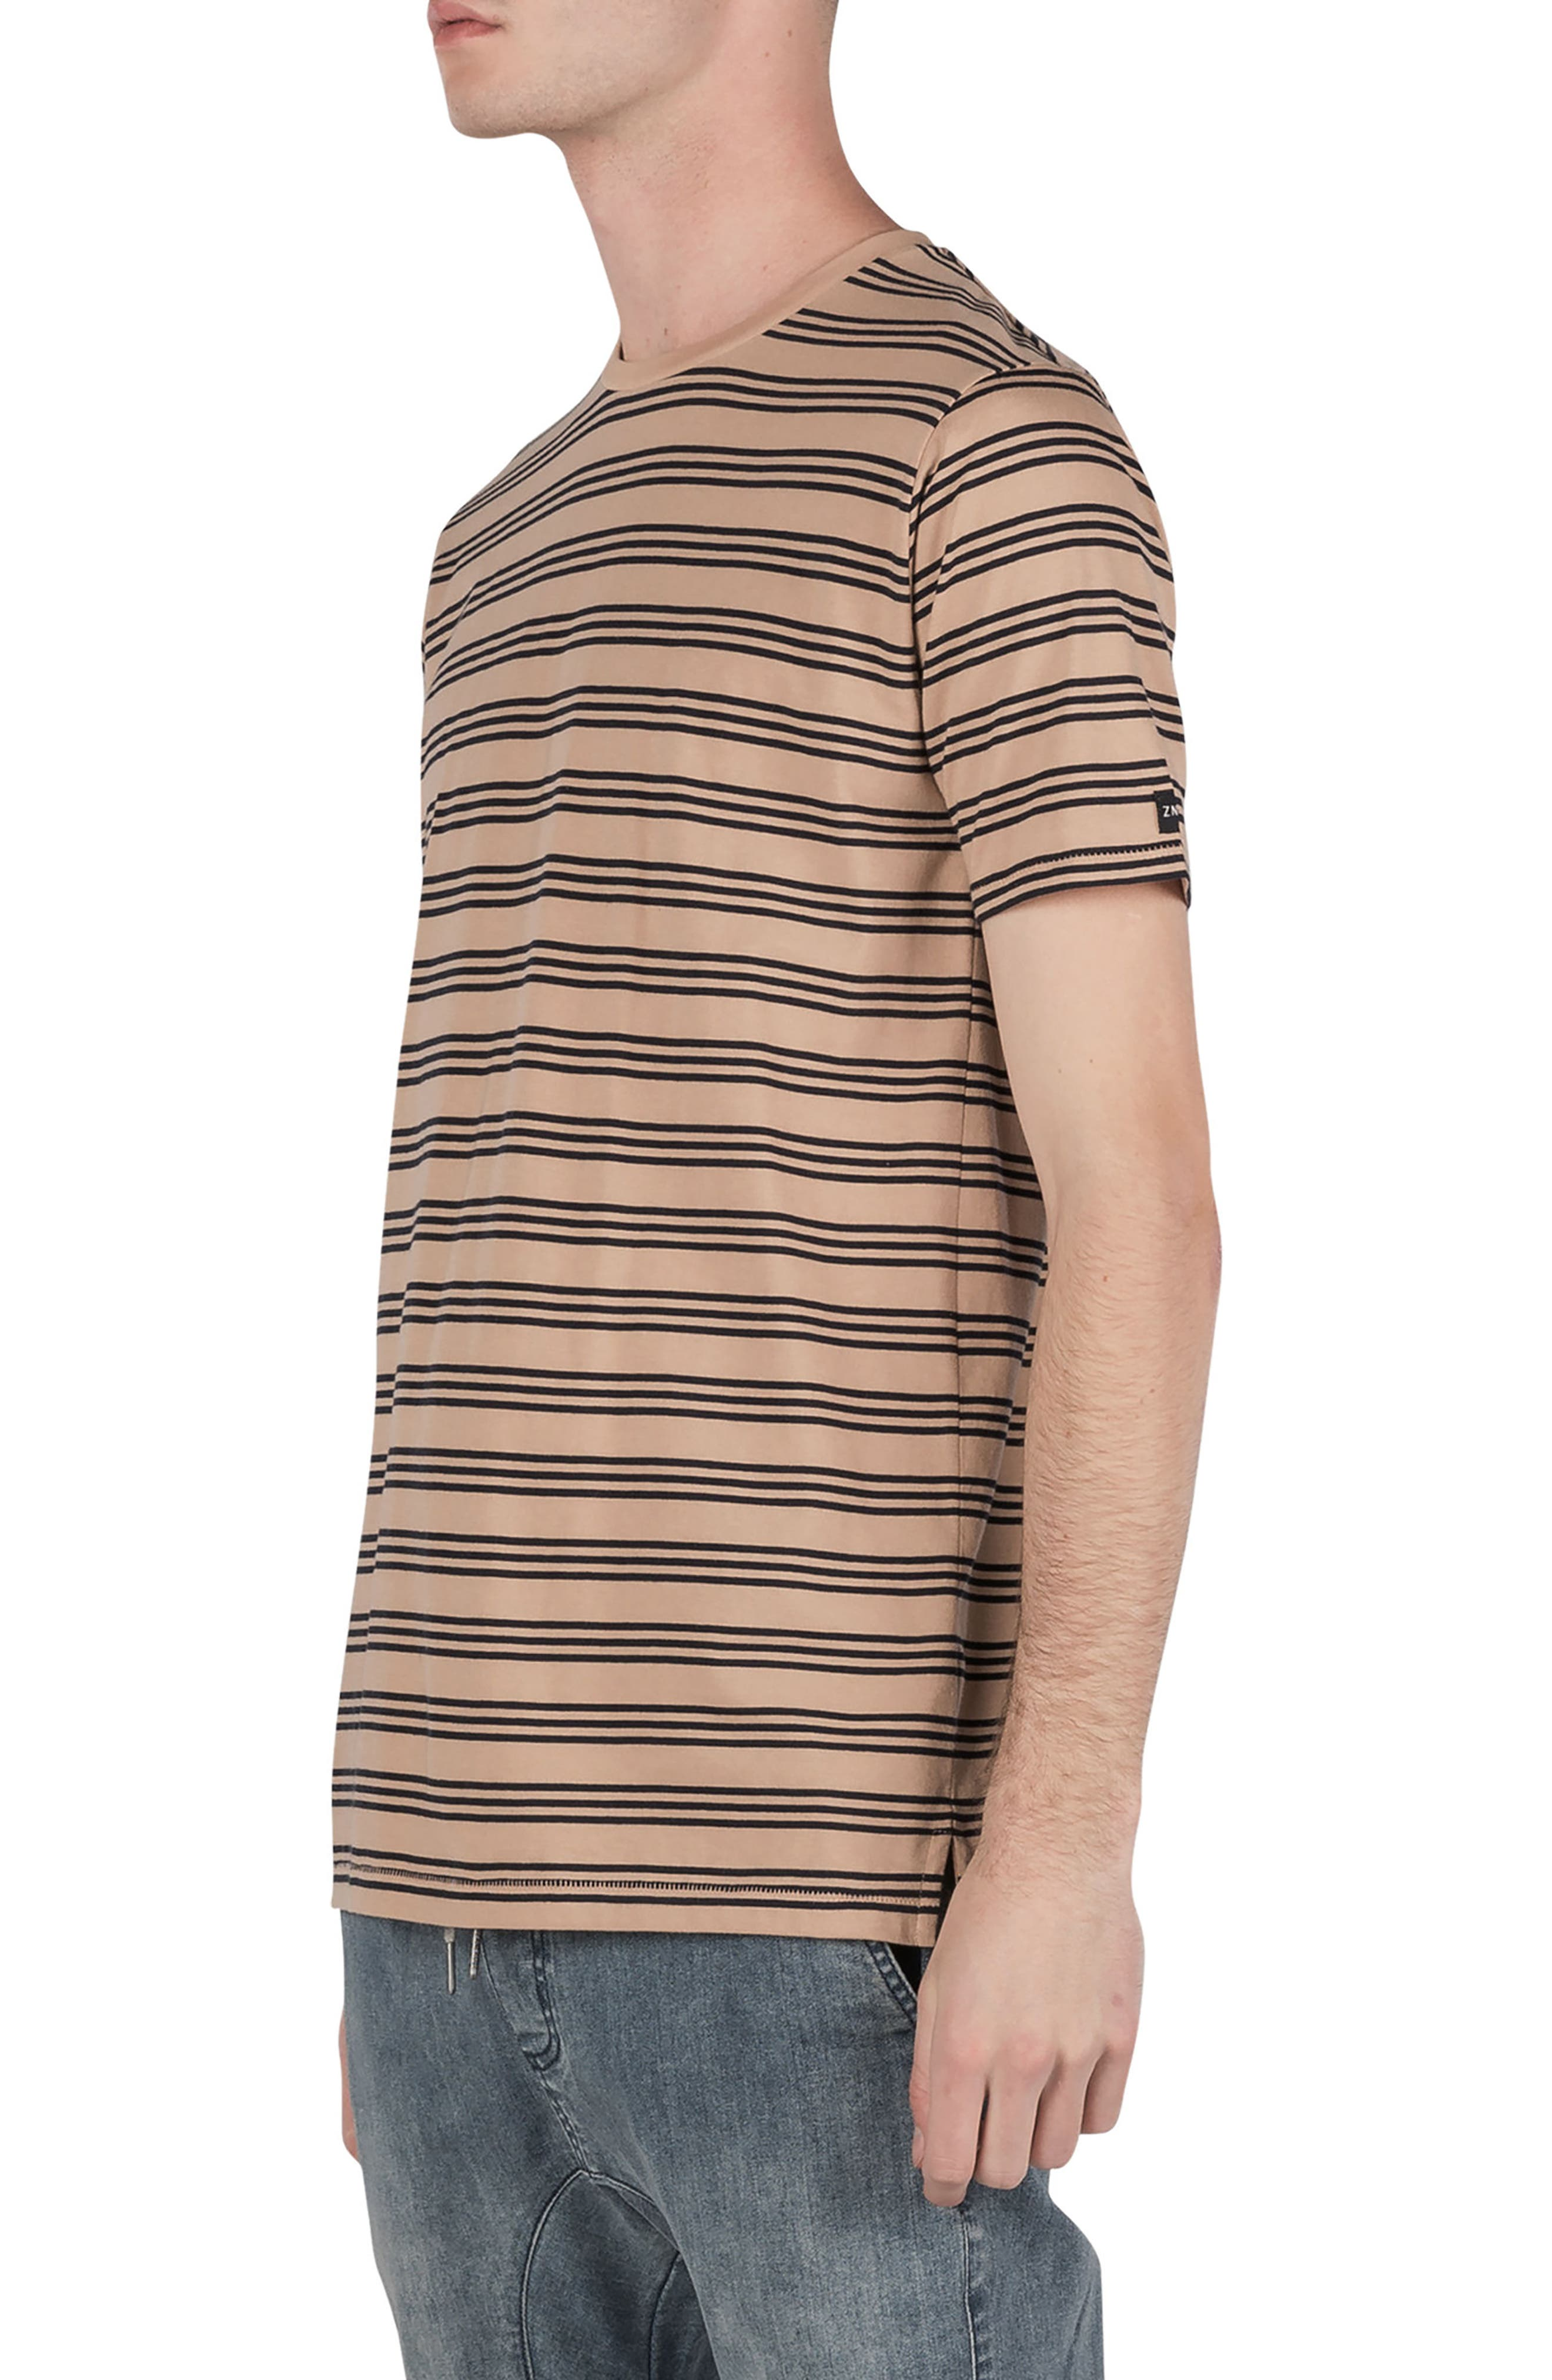 Flintlock Stripe T-Shirt,                             Alternate thumbnail 5, color,                             251